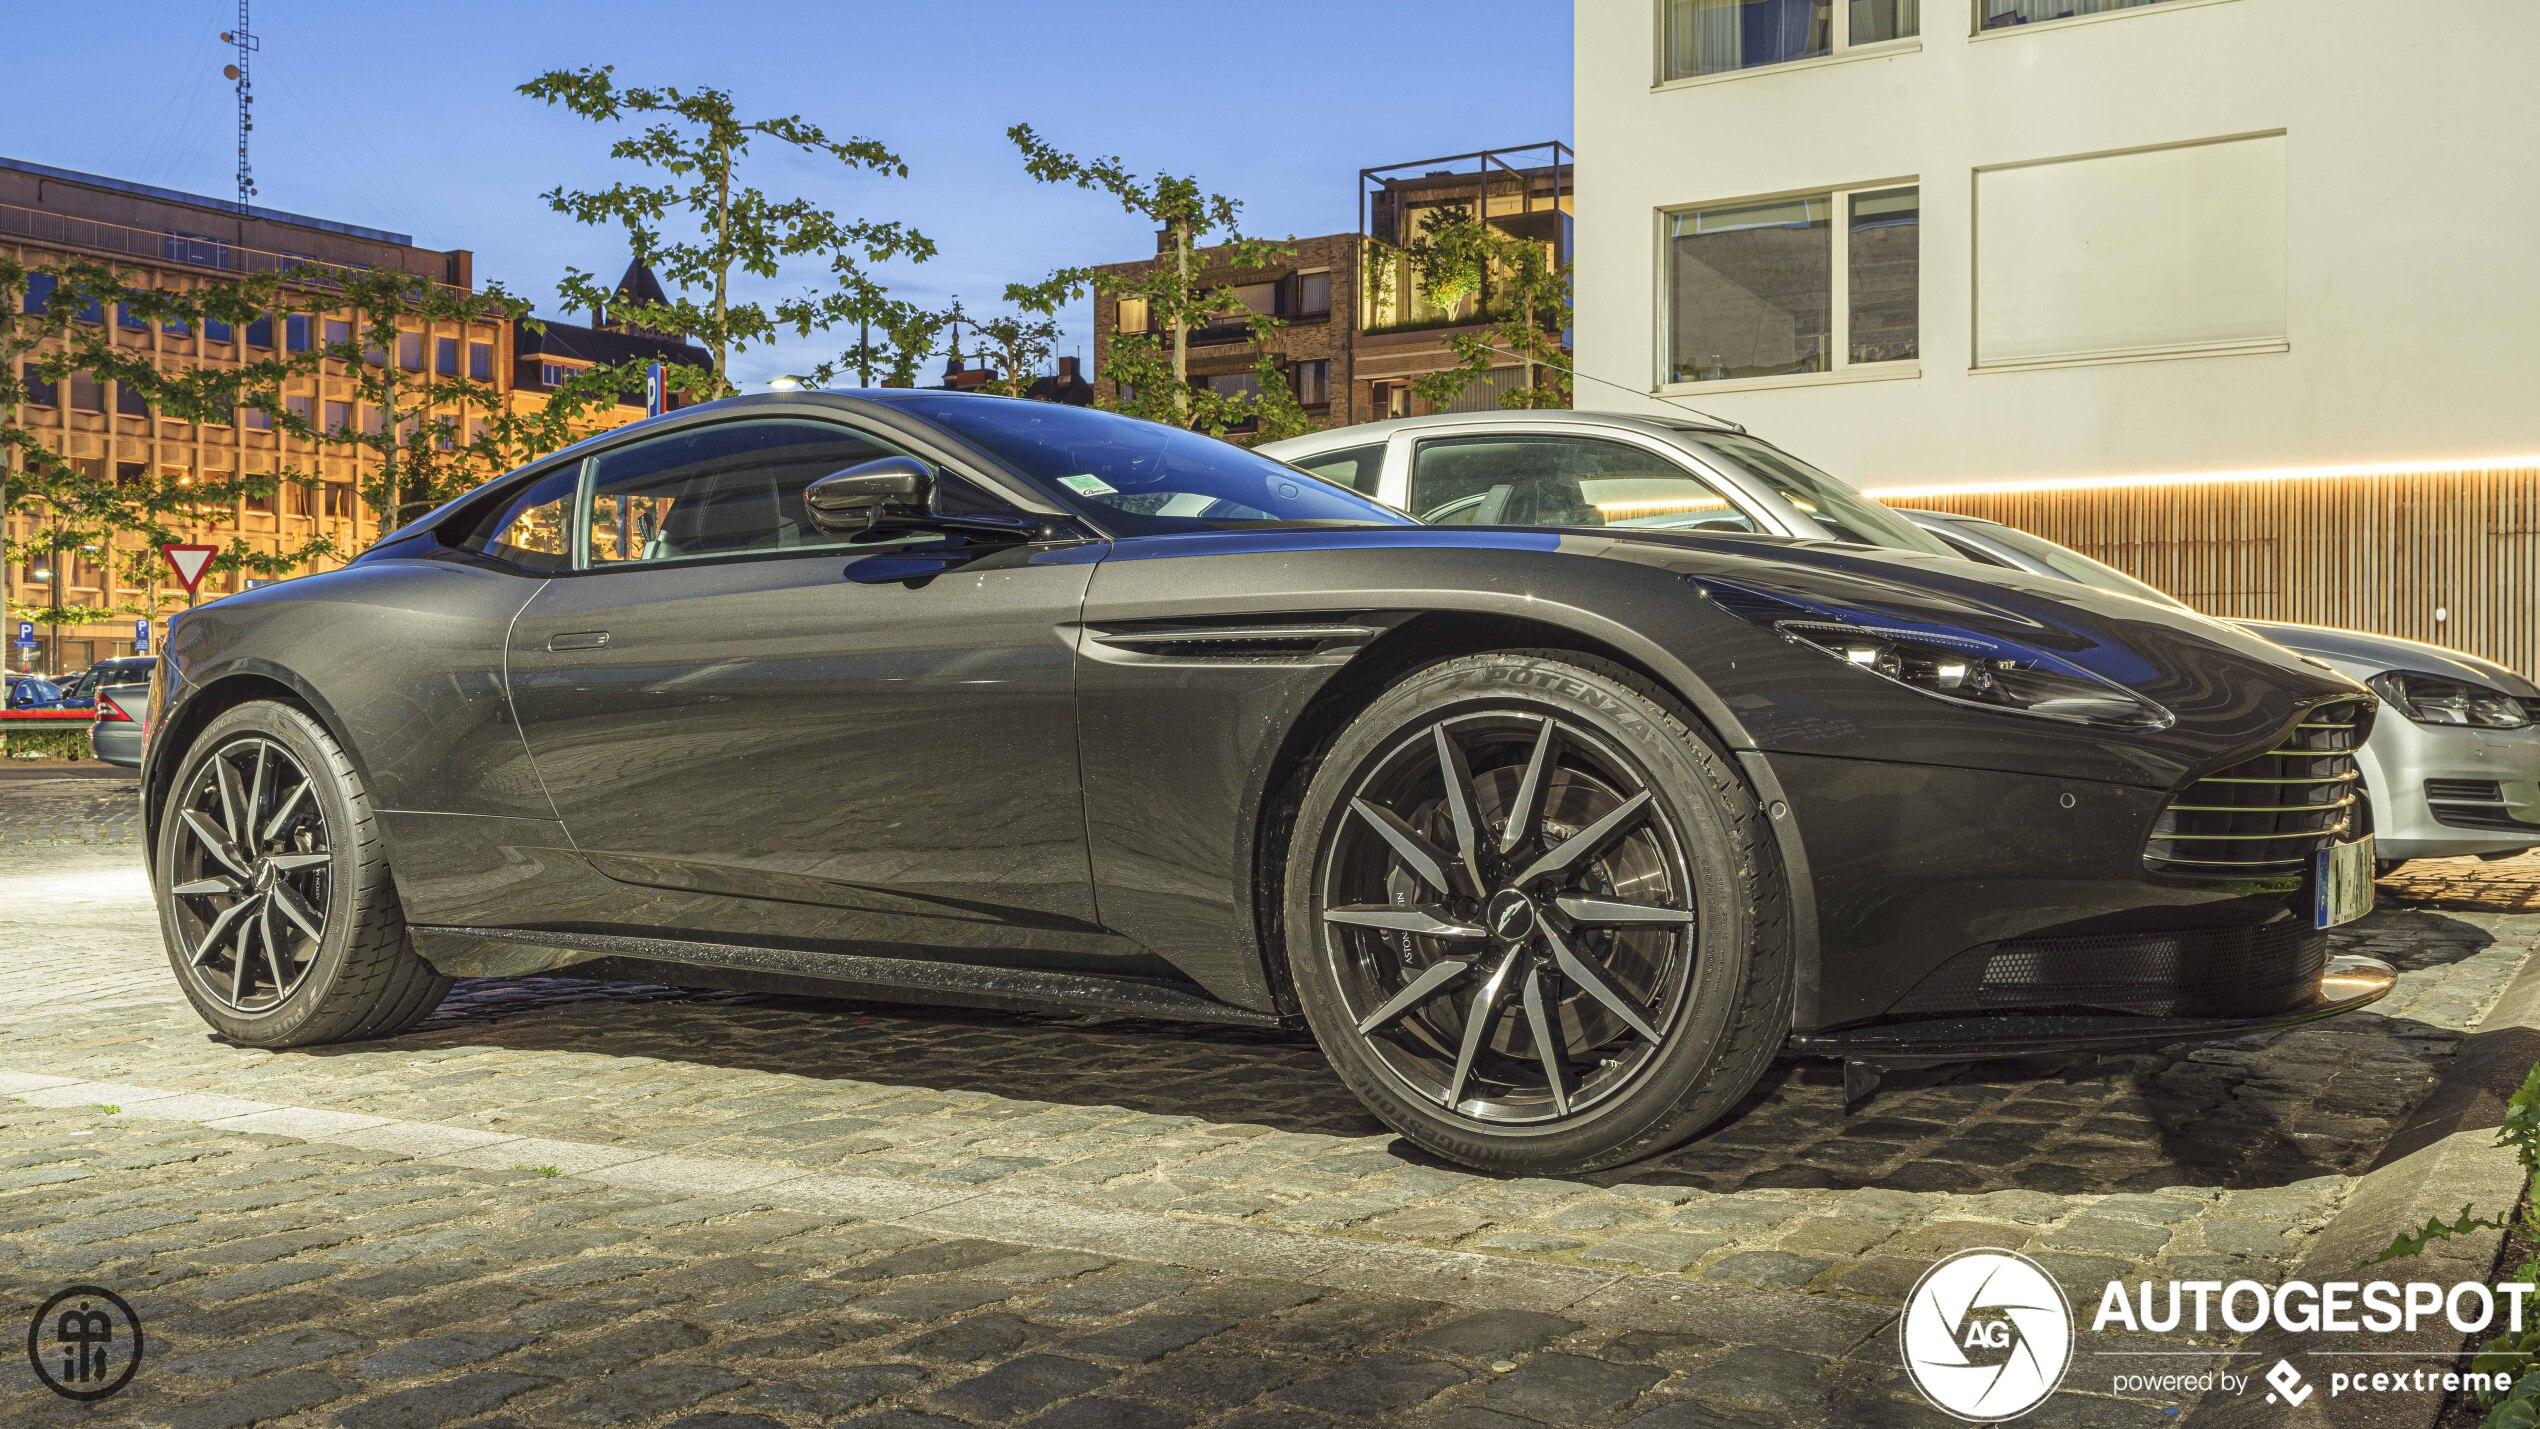 Aston Martin Db11 V8 20 Januar 2020 Autogespot